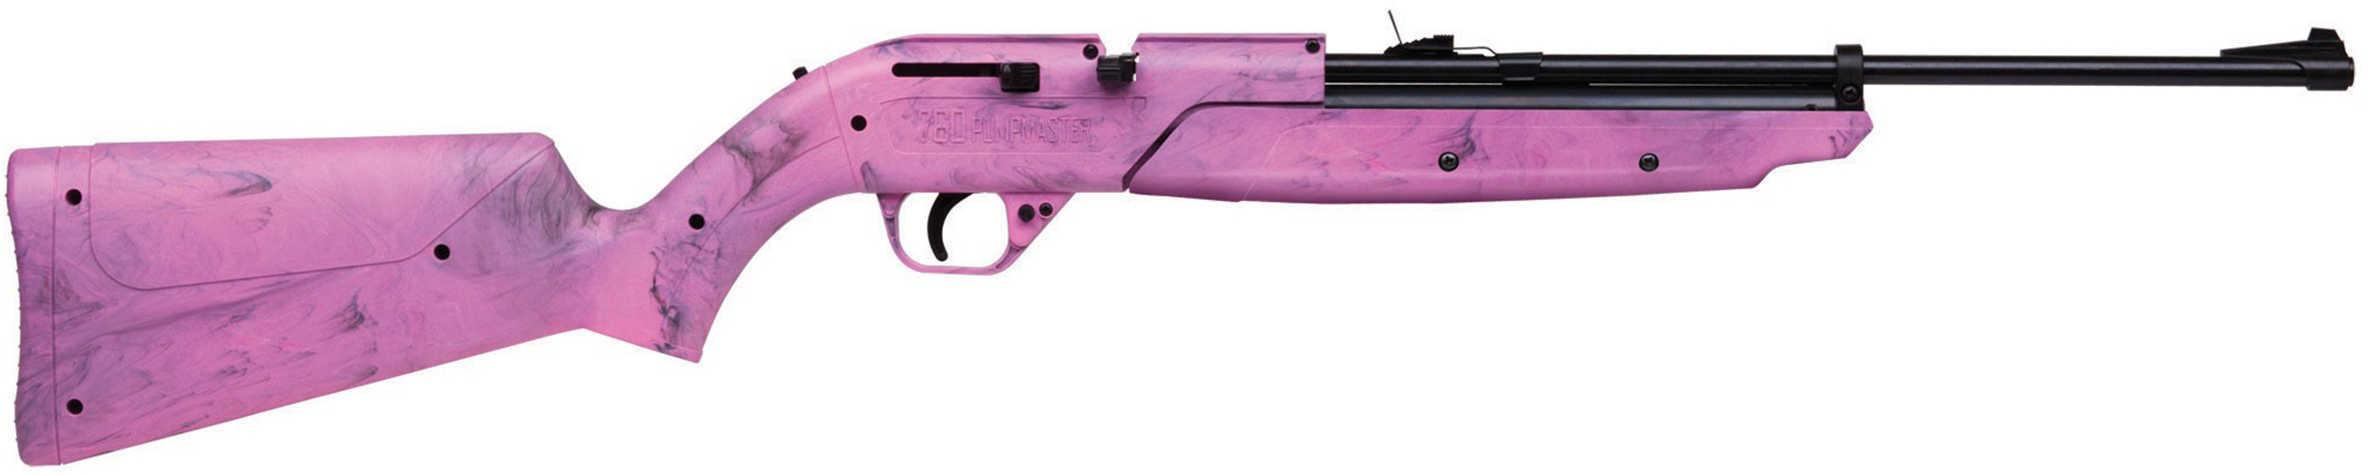 "Crosman Model 760 Pumpmaster .177 BB 17"" Pink Synthetic Stock Pump Single Shot 625 Feet Per Second 760P"